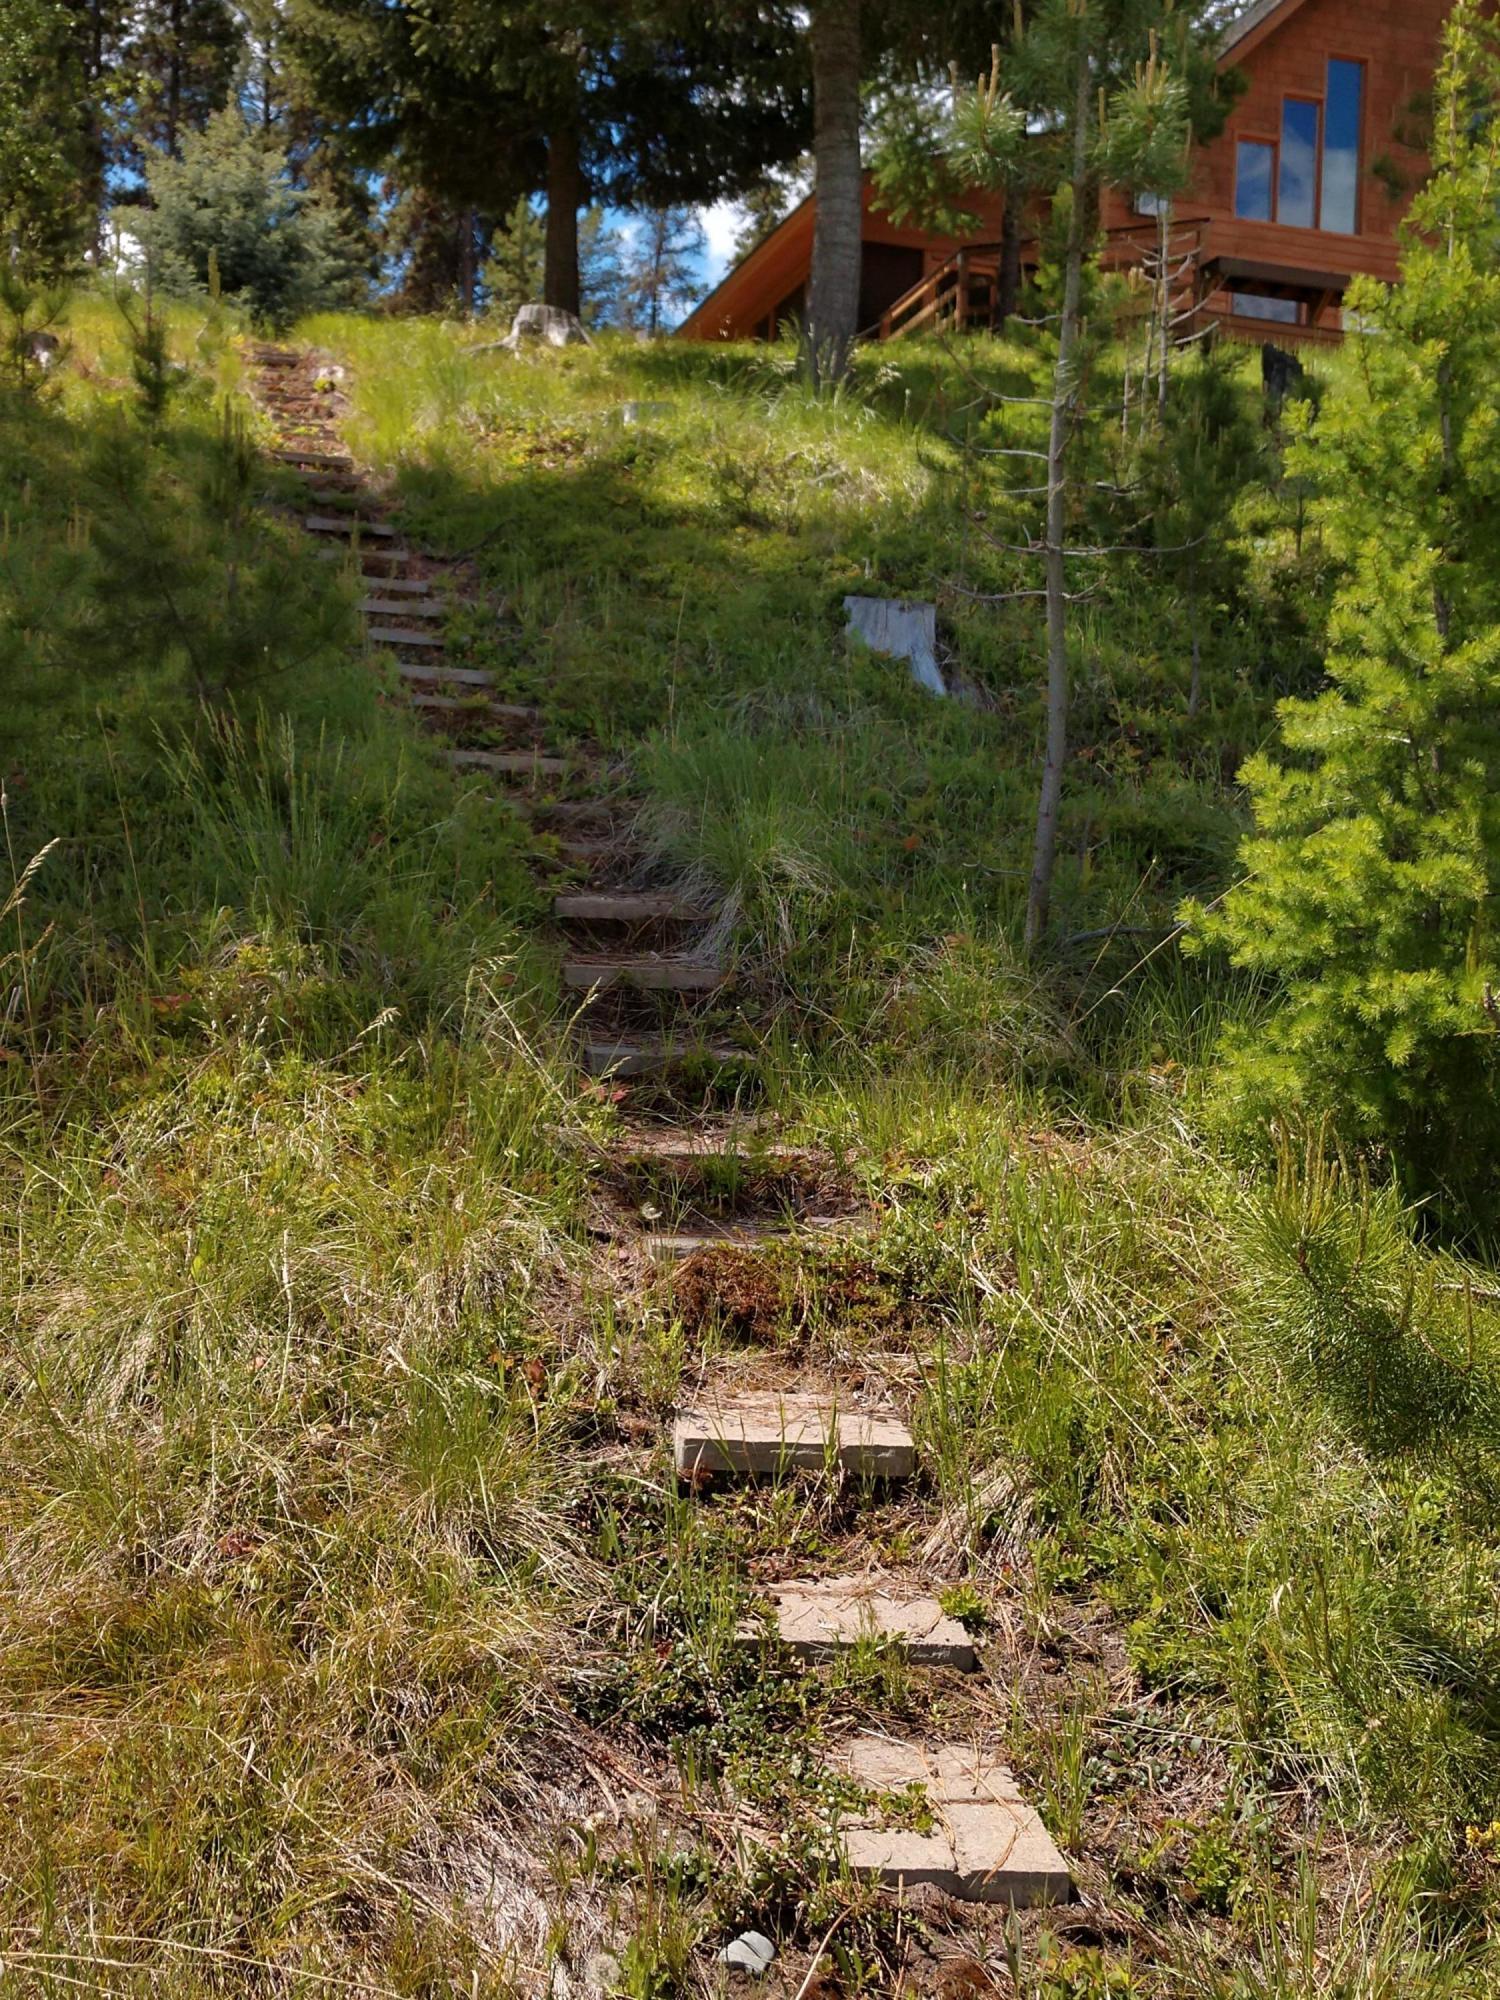 740 Overland Trail, Seeley Lake, 59868, MLS # 21900370   Berkshire Hathaway  HomeServices Montana Properties